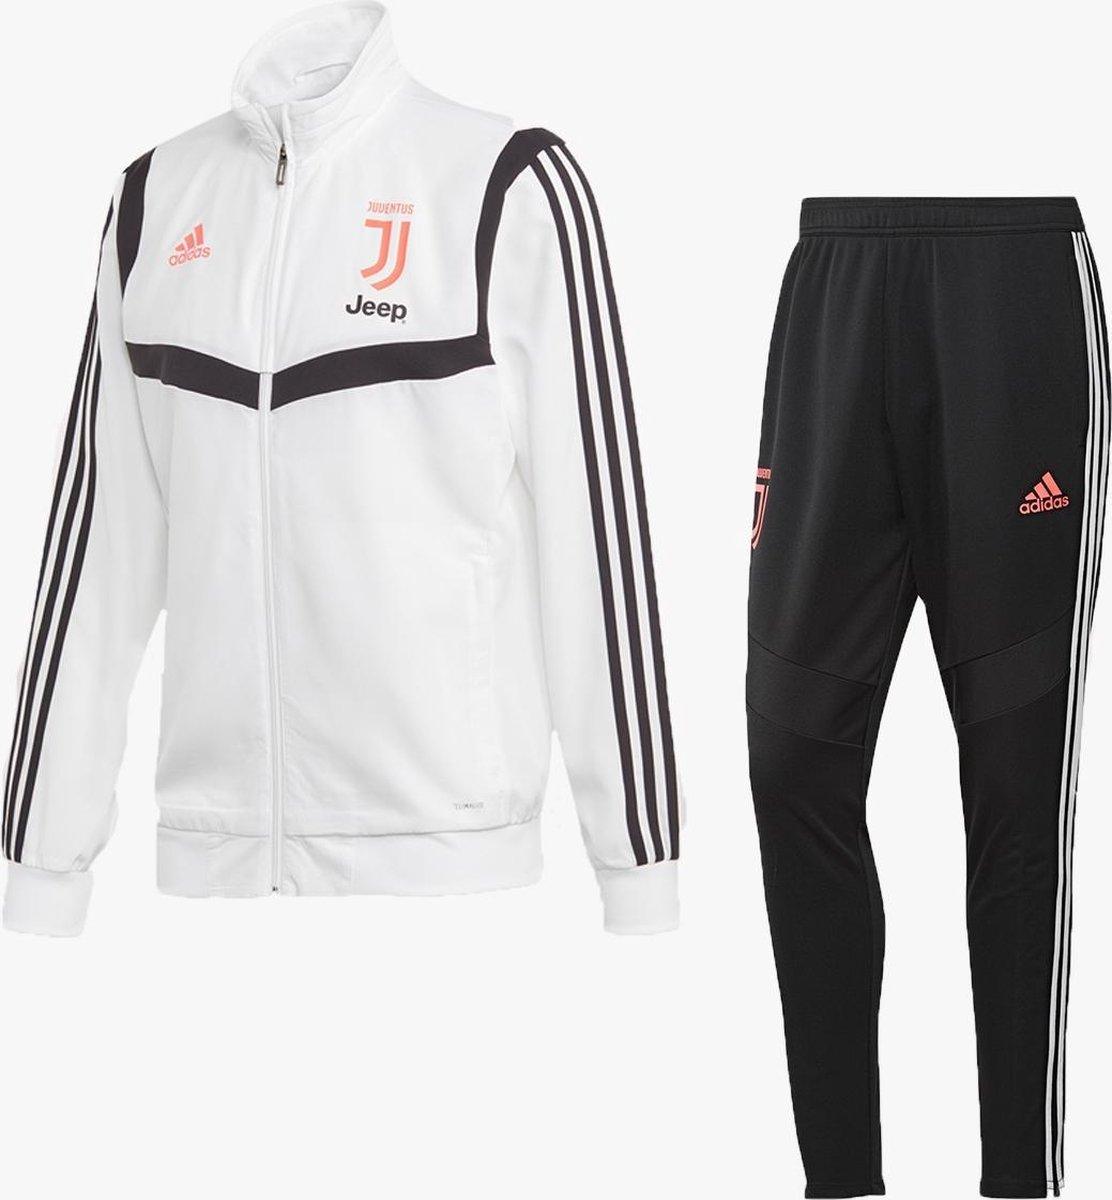 bol com adidas juventus trainingspak presentatie 2019 2020 wit maat xs bol com adidas juventus trainingspak